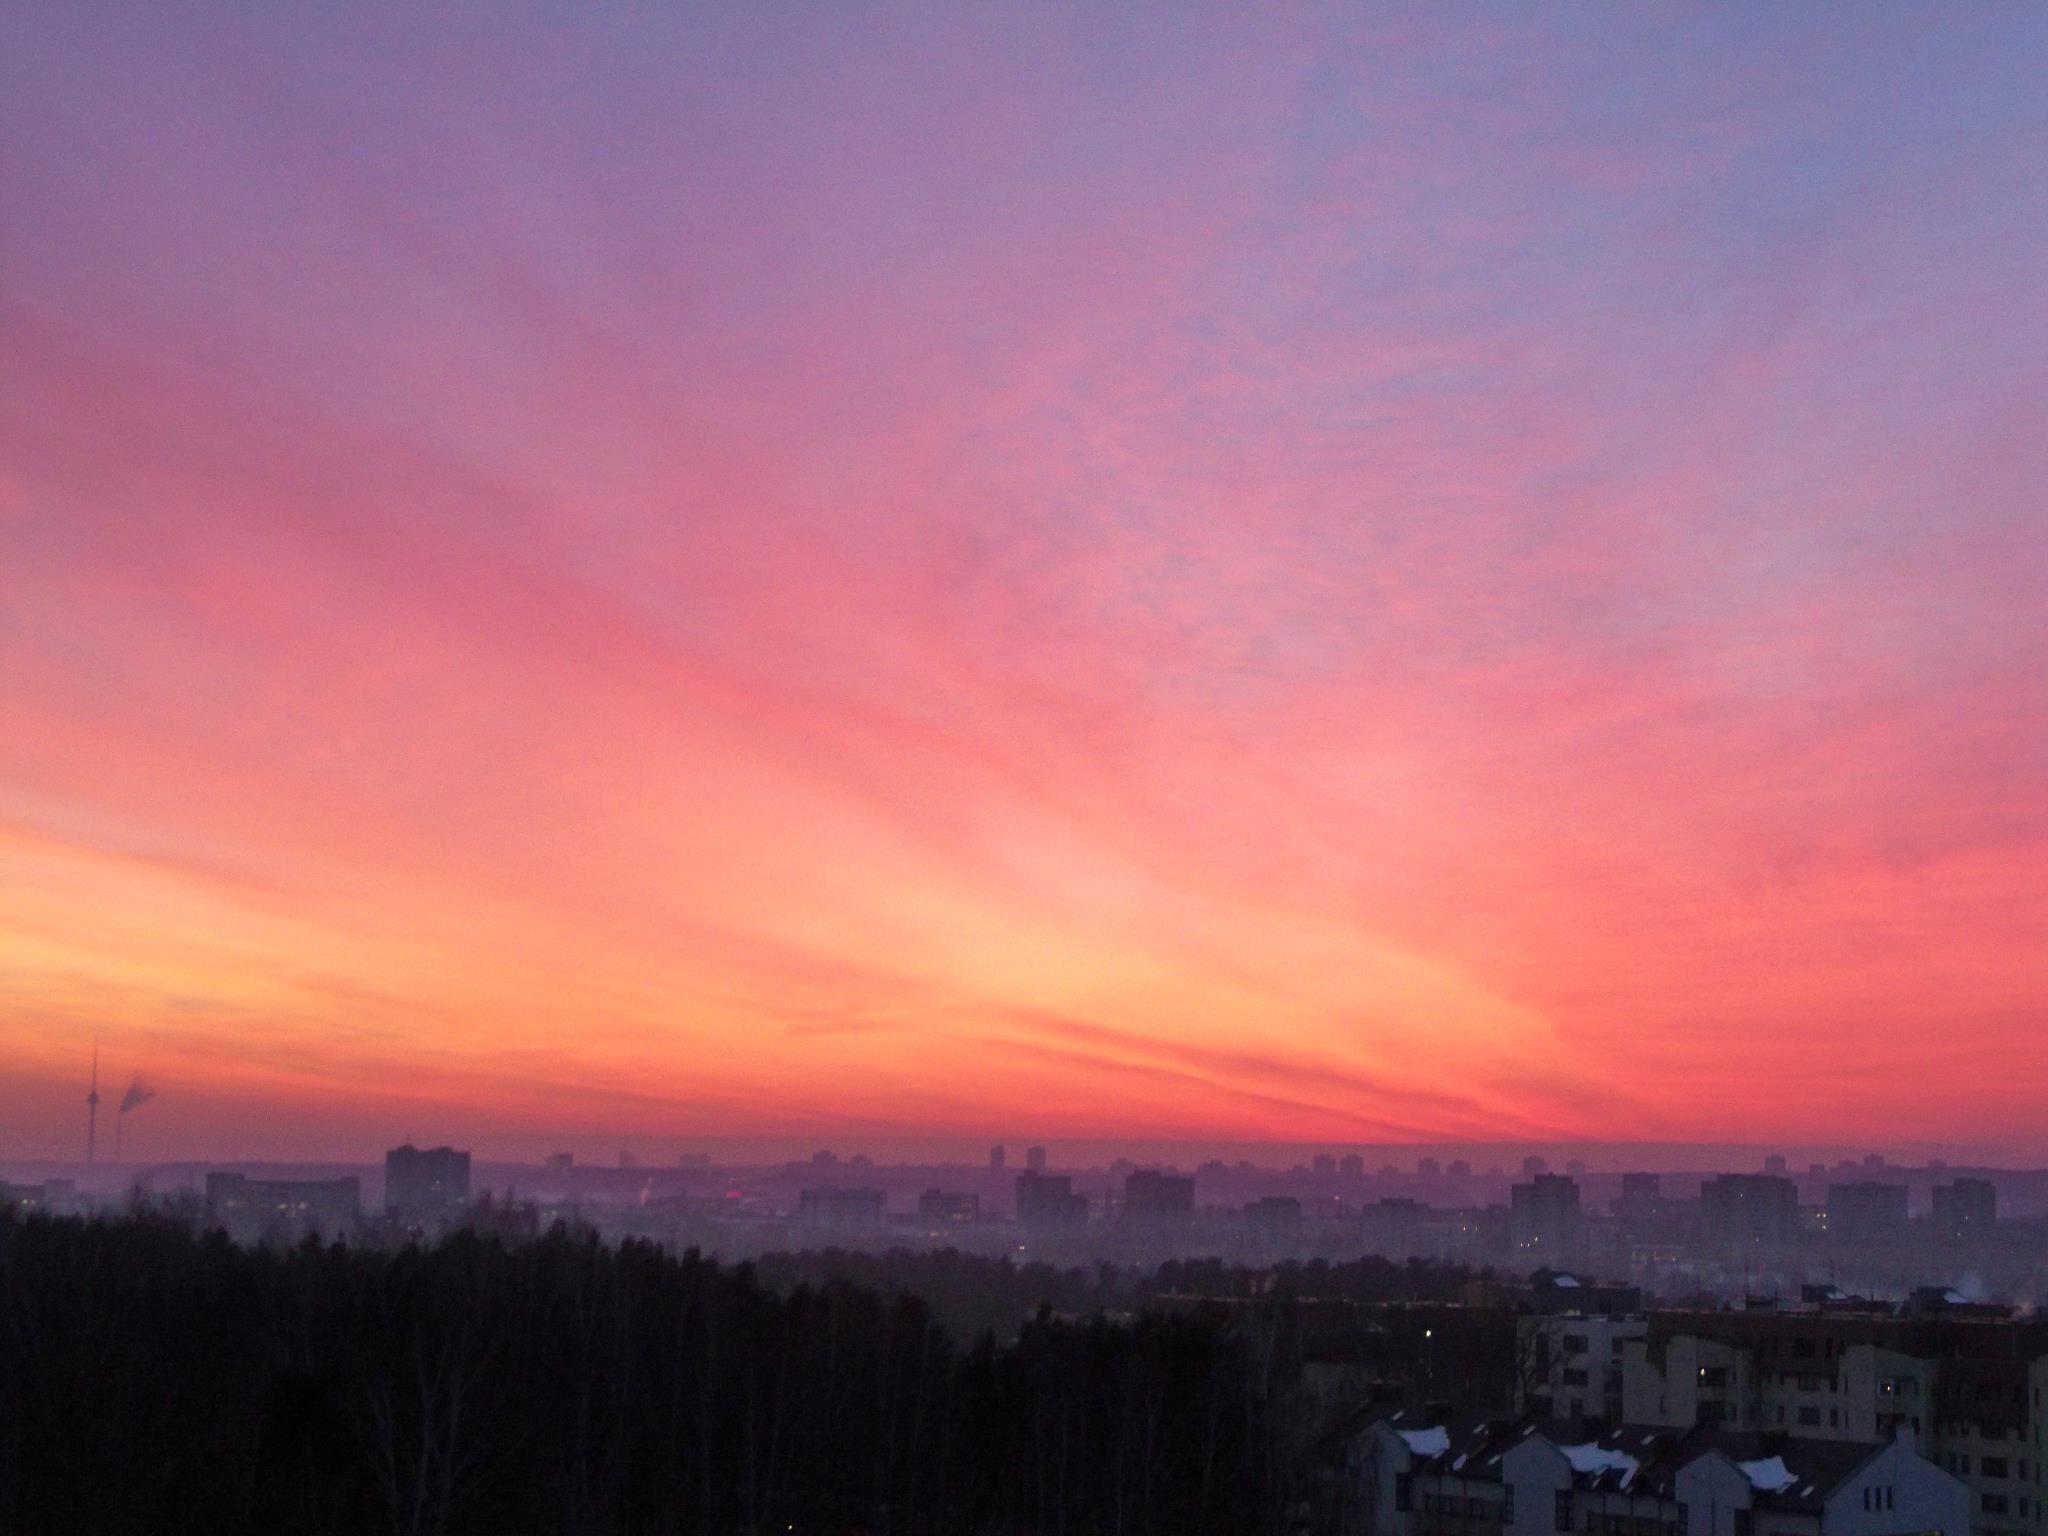 Pink Skies wallpaper